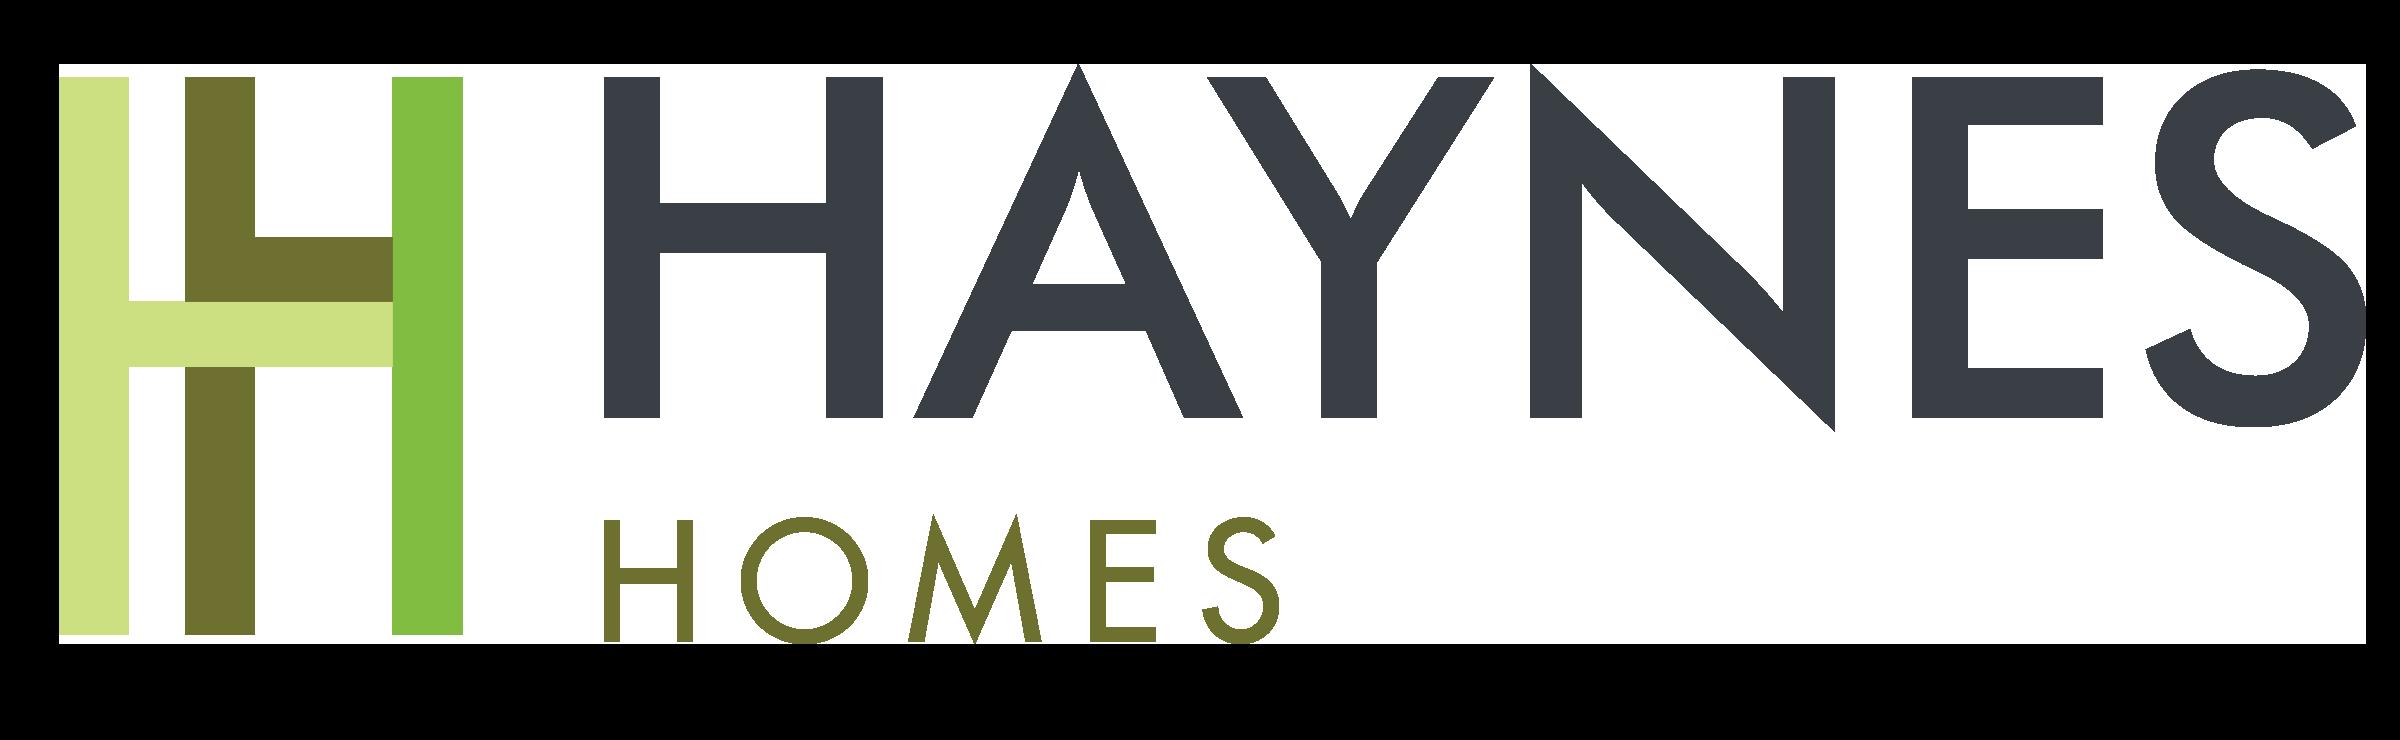 Haynes_Homes_Logo_Color.png